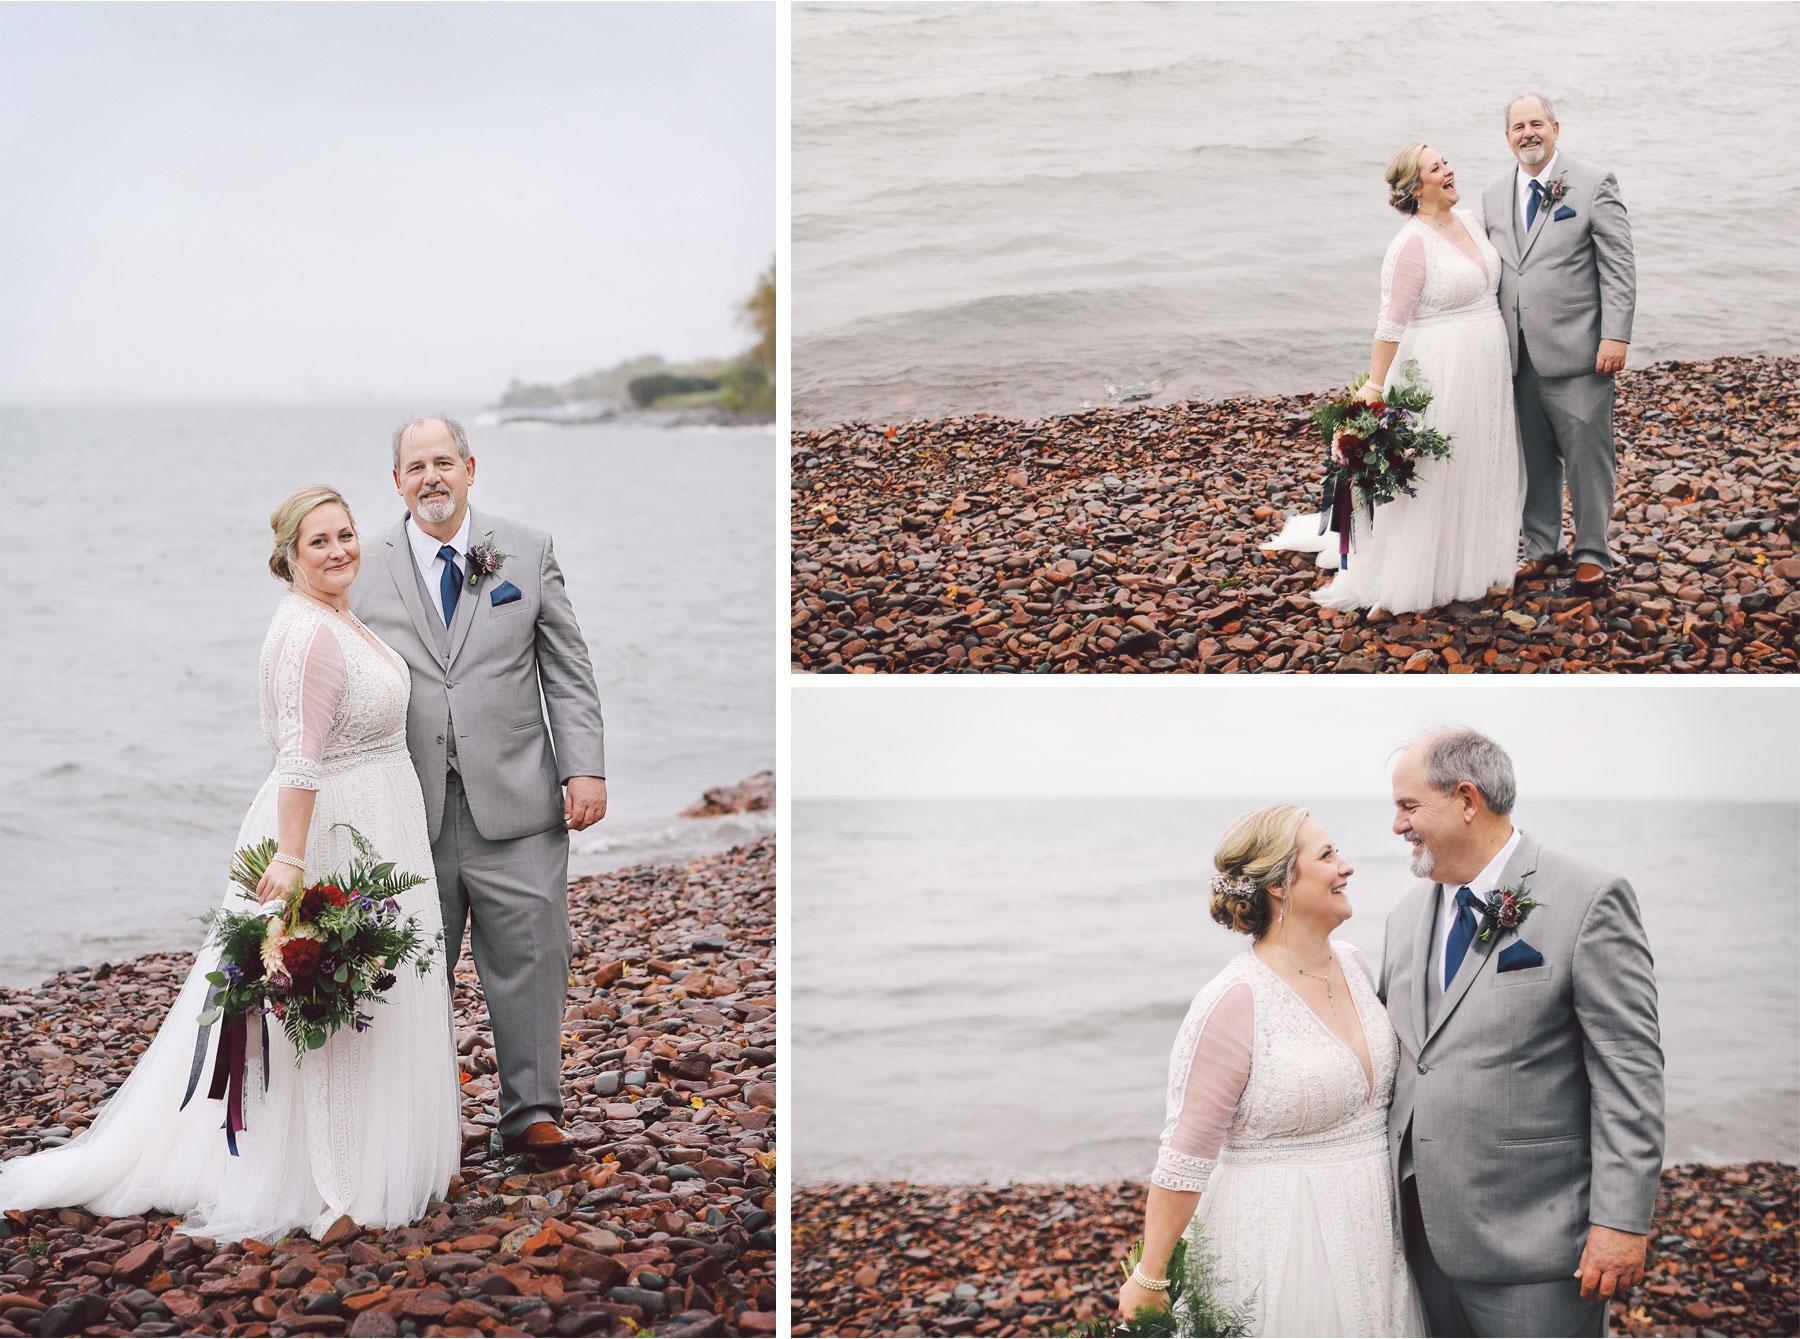 06-Duluth-Minnesota-Wedding-Photography-by-Vick-Photography-Glensheen-Mansion-Rain-Lake-Superior-Kelli-and-Marc.jpg